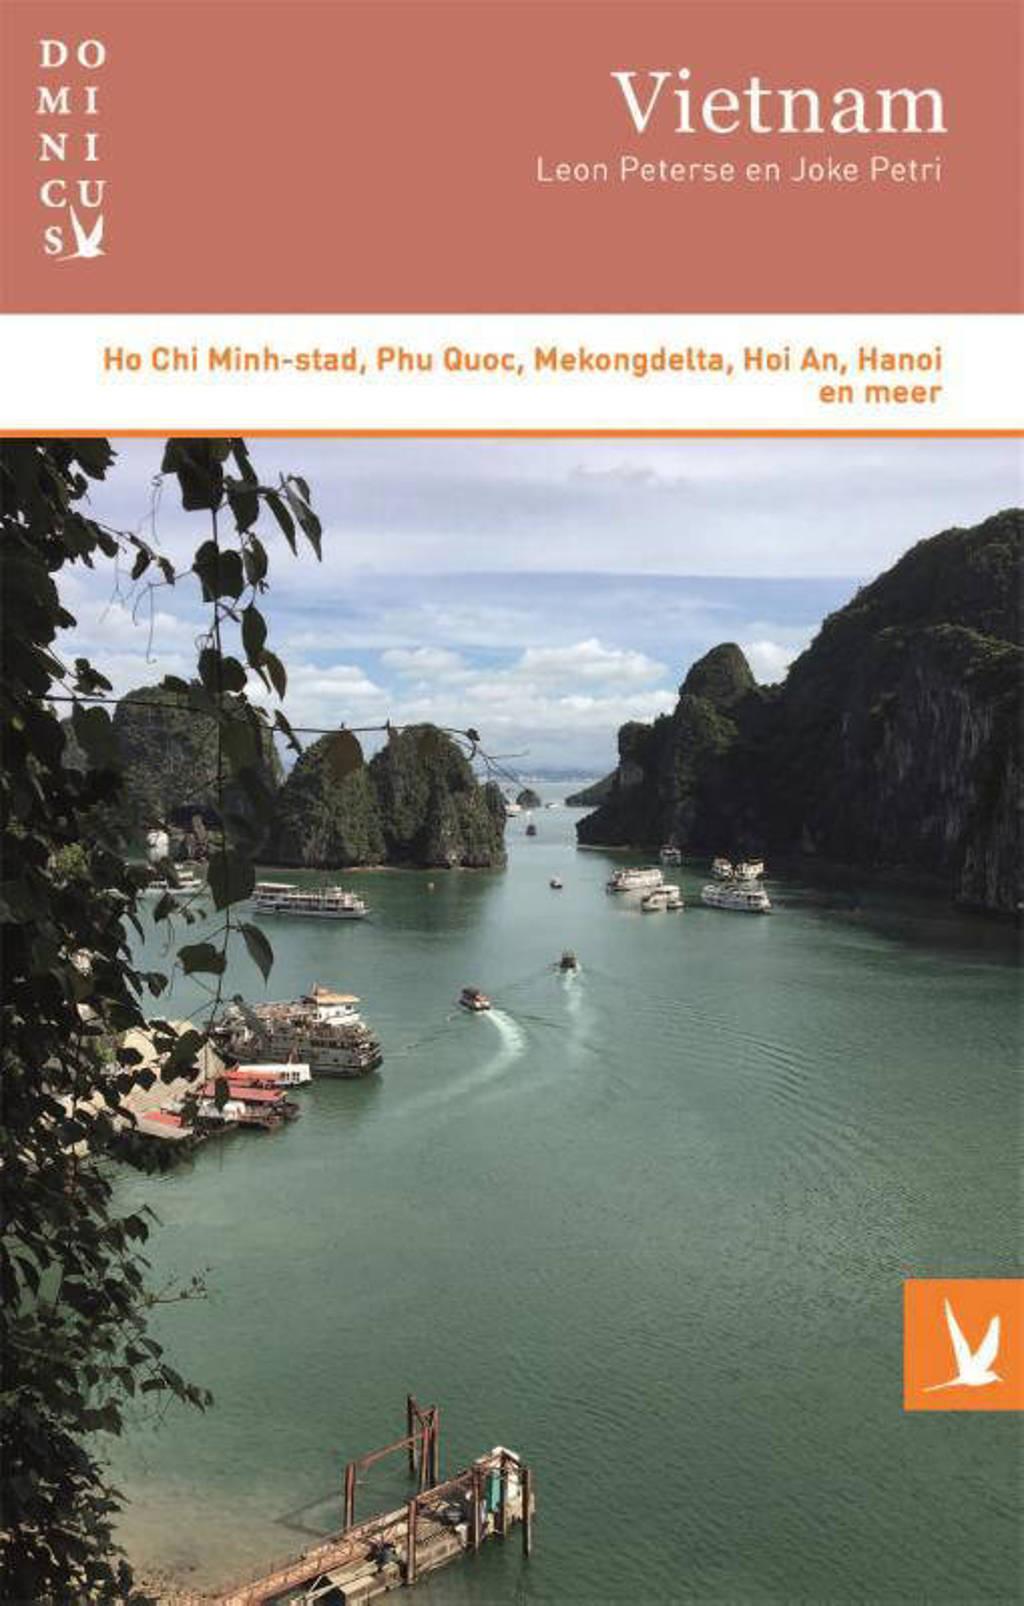 Dominicus: Vietnam - Joke Petri